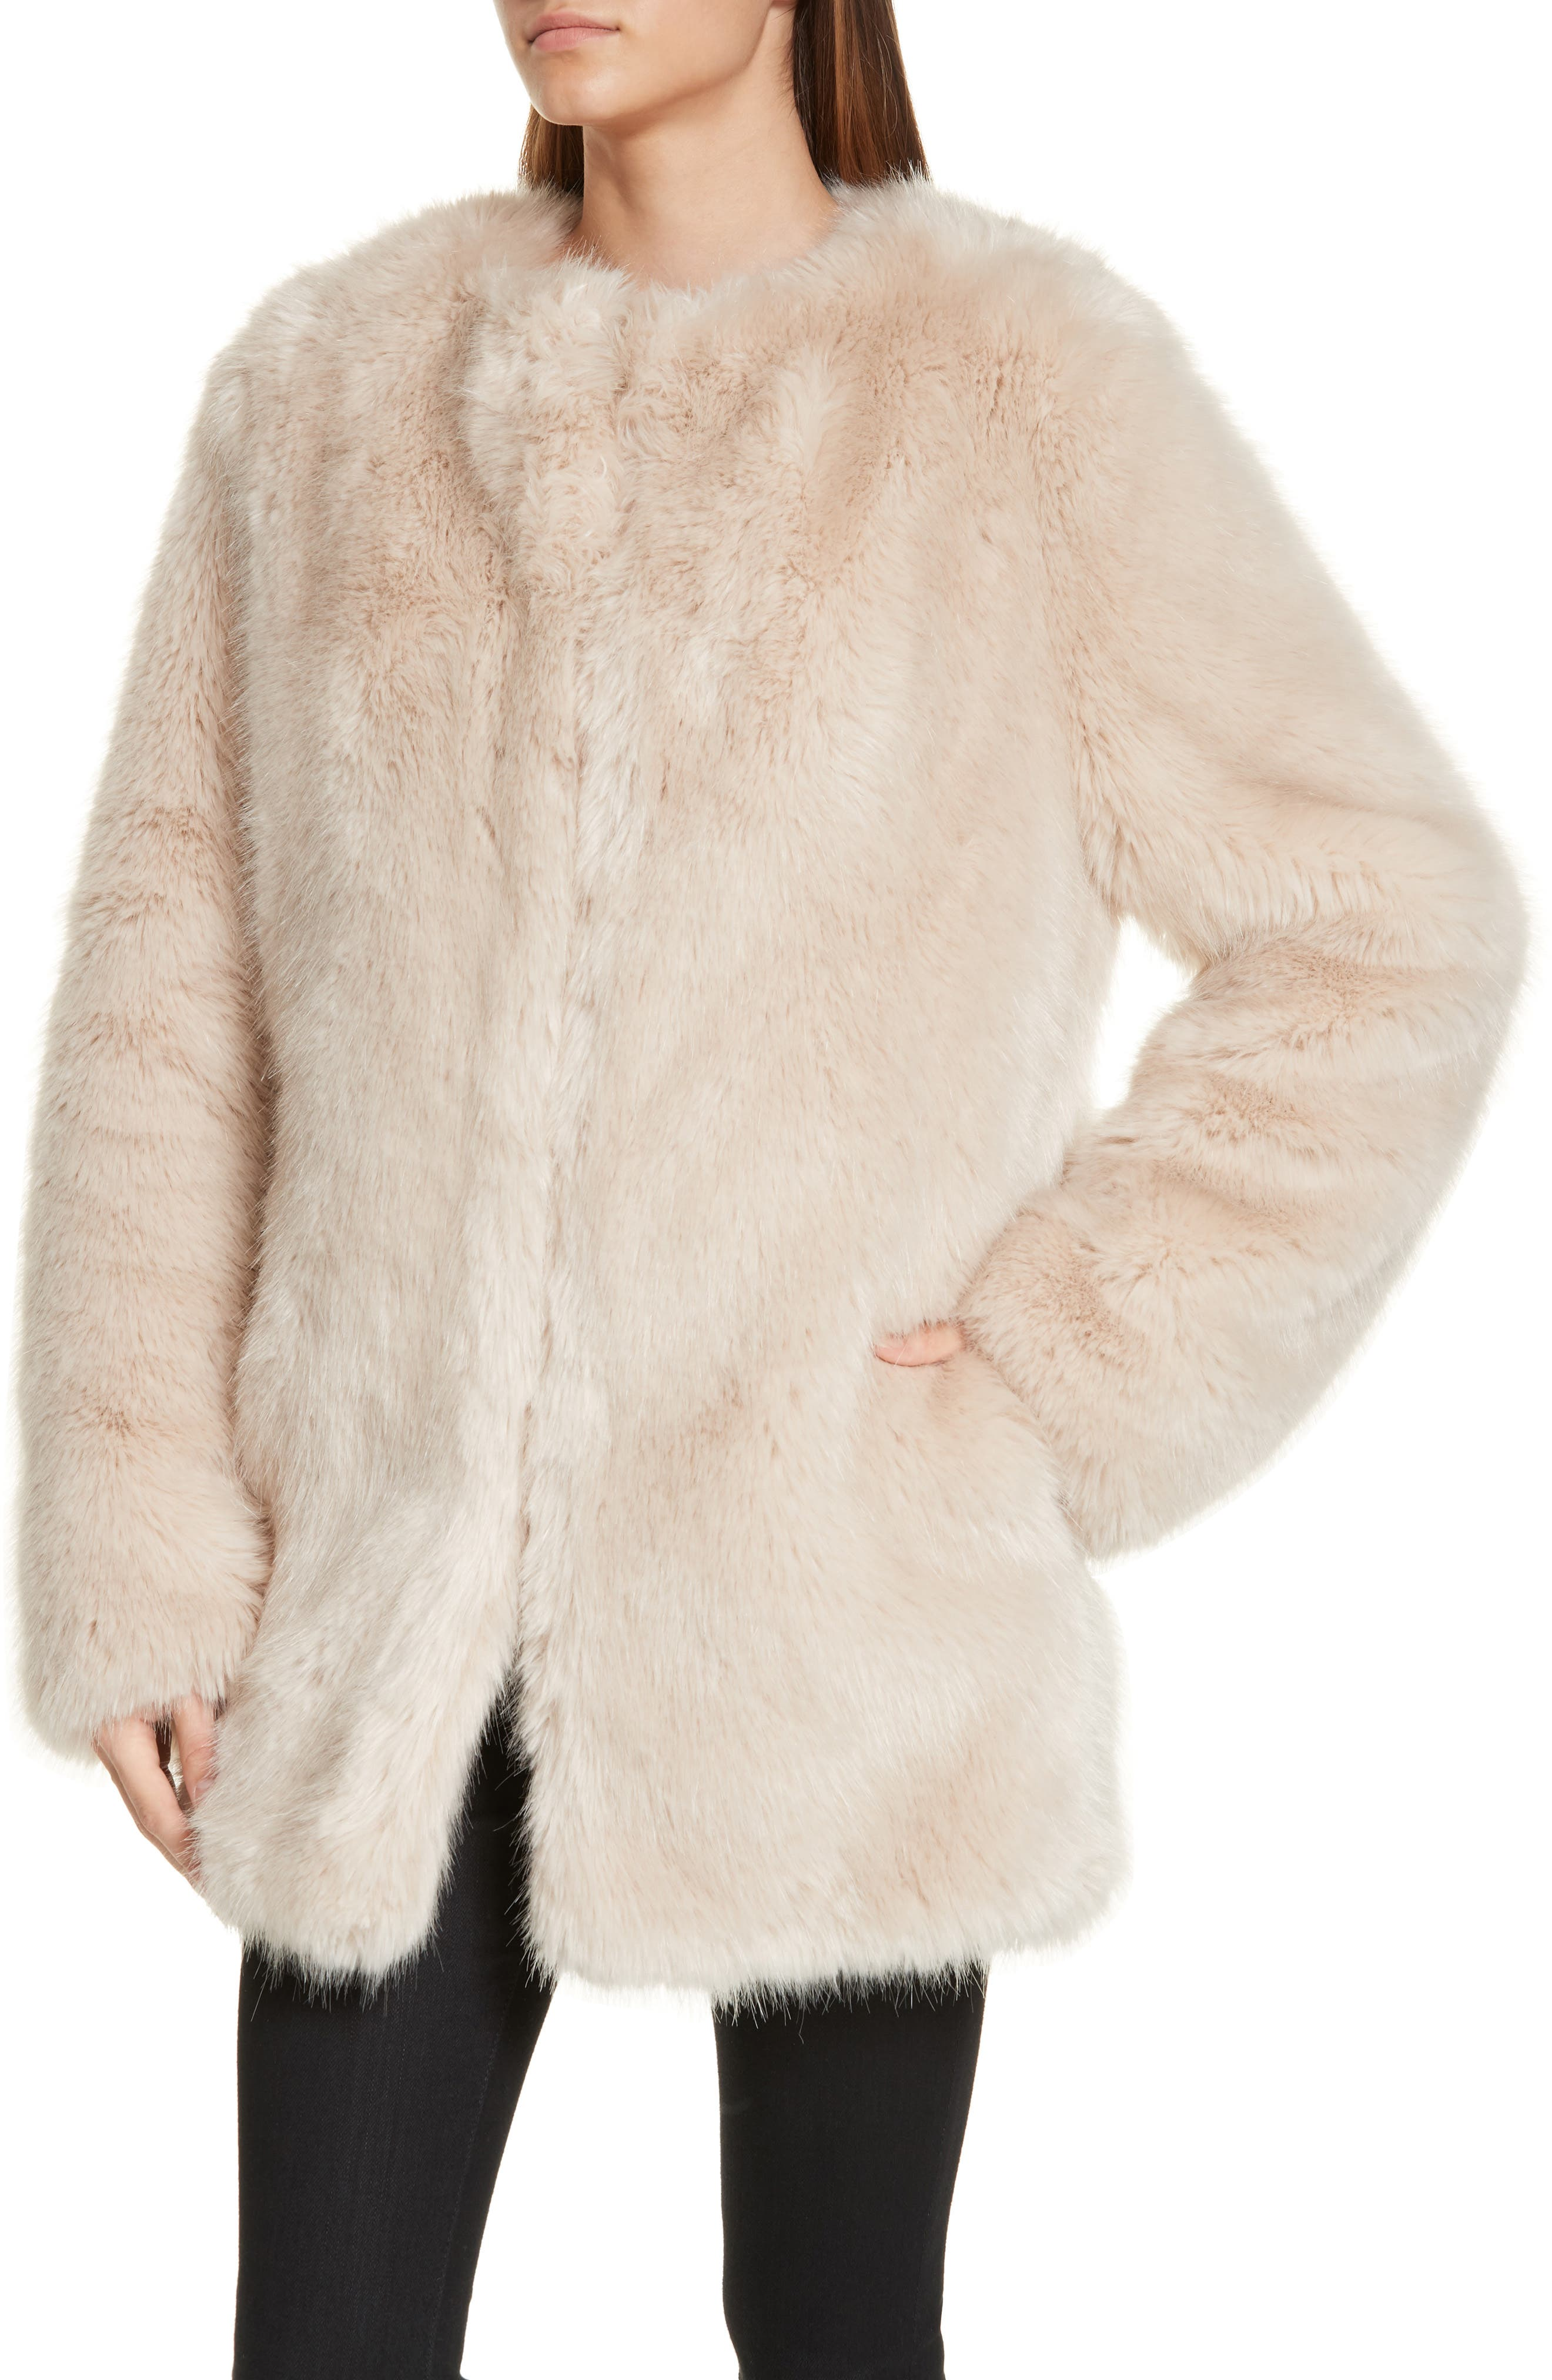 HELMUT LANG, Faux Fur Coat, Alternate thumbnail 5, color, OATMEAL